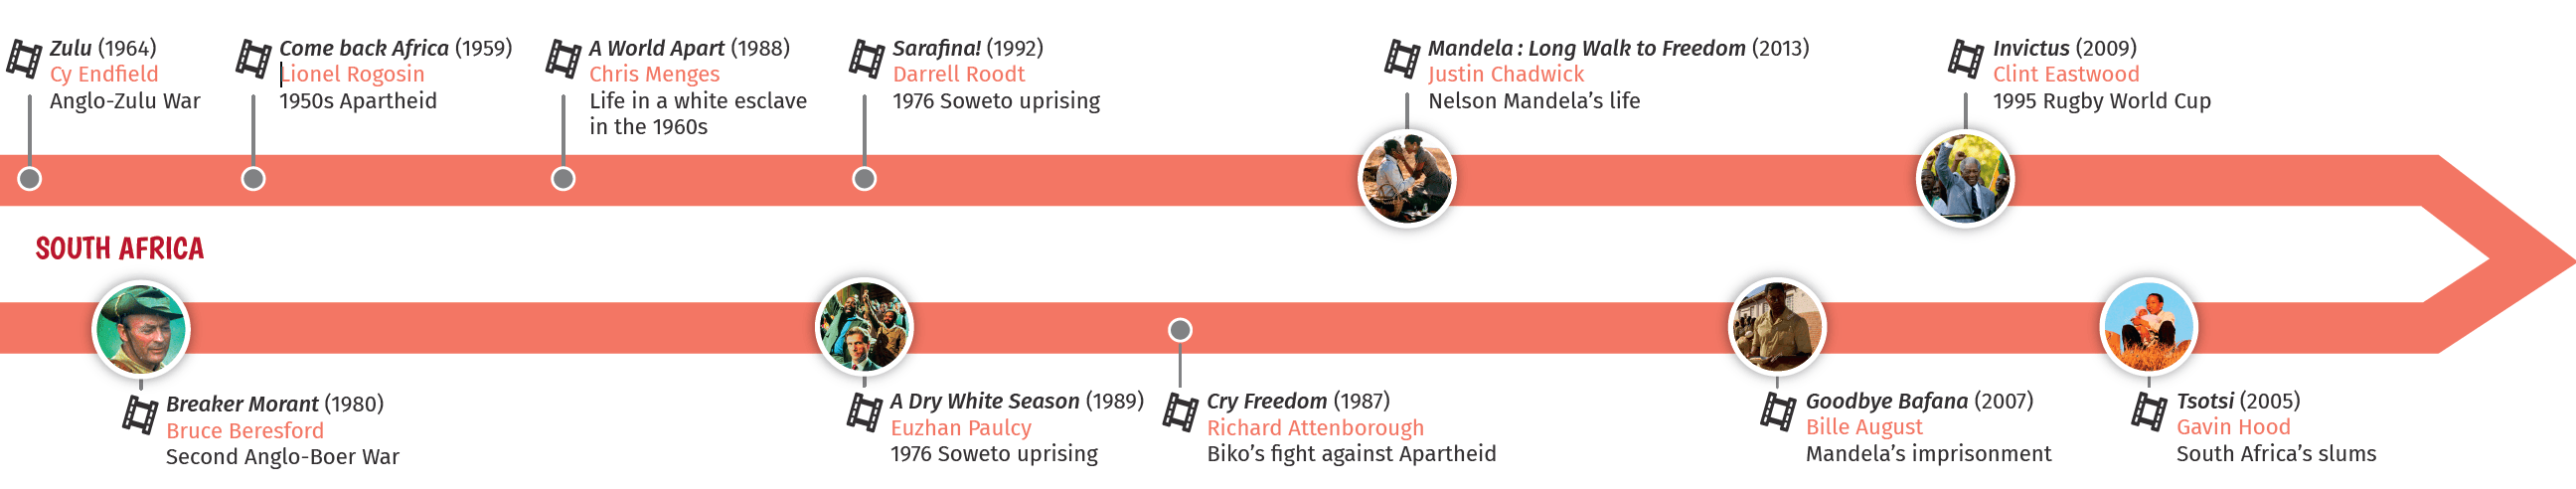 Précis culturel South Africa